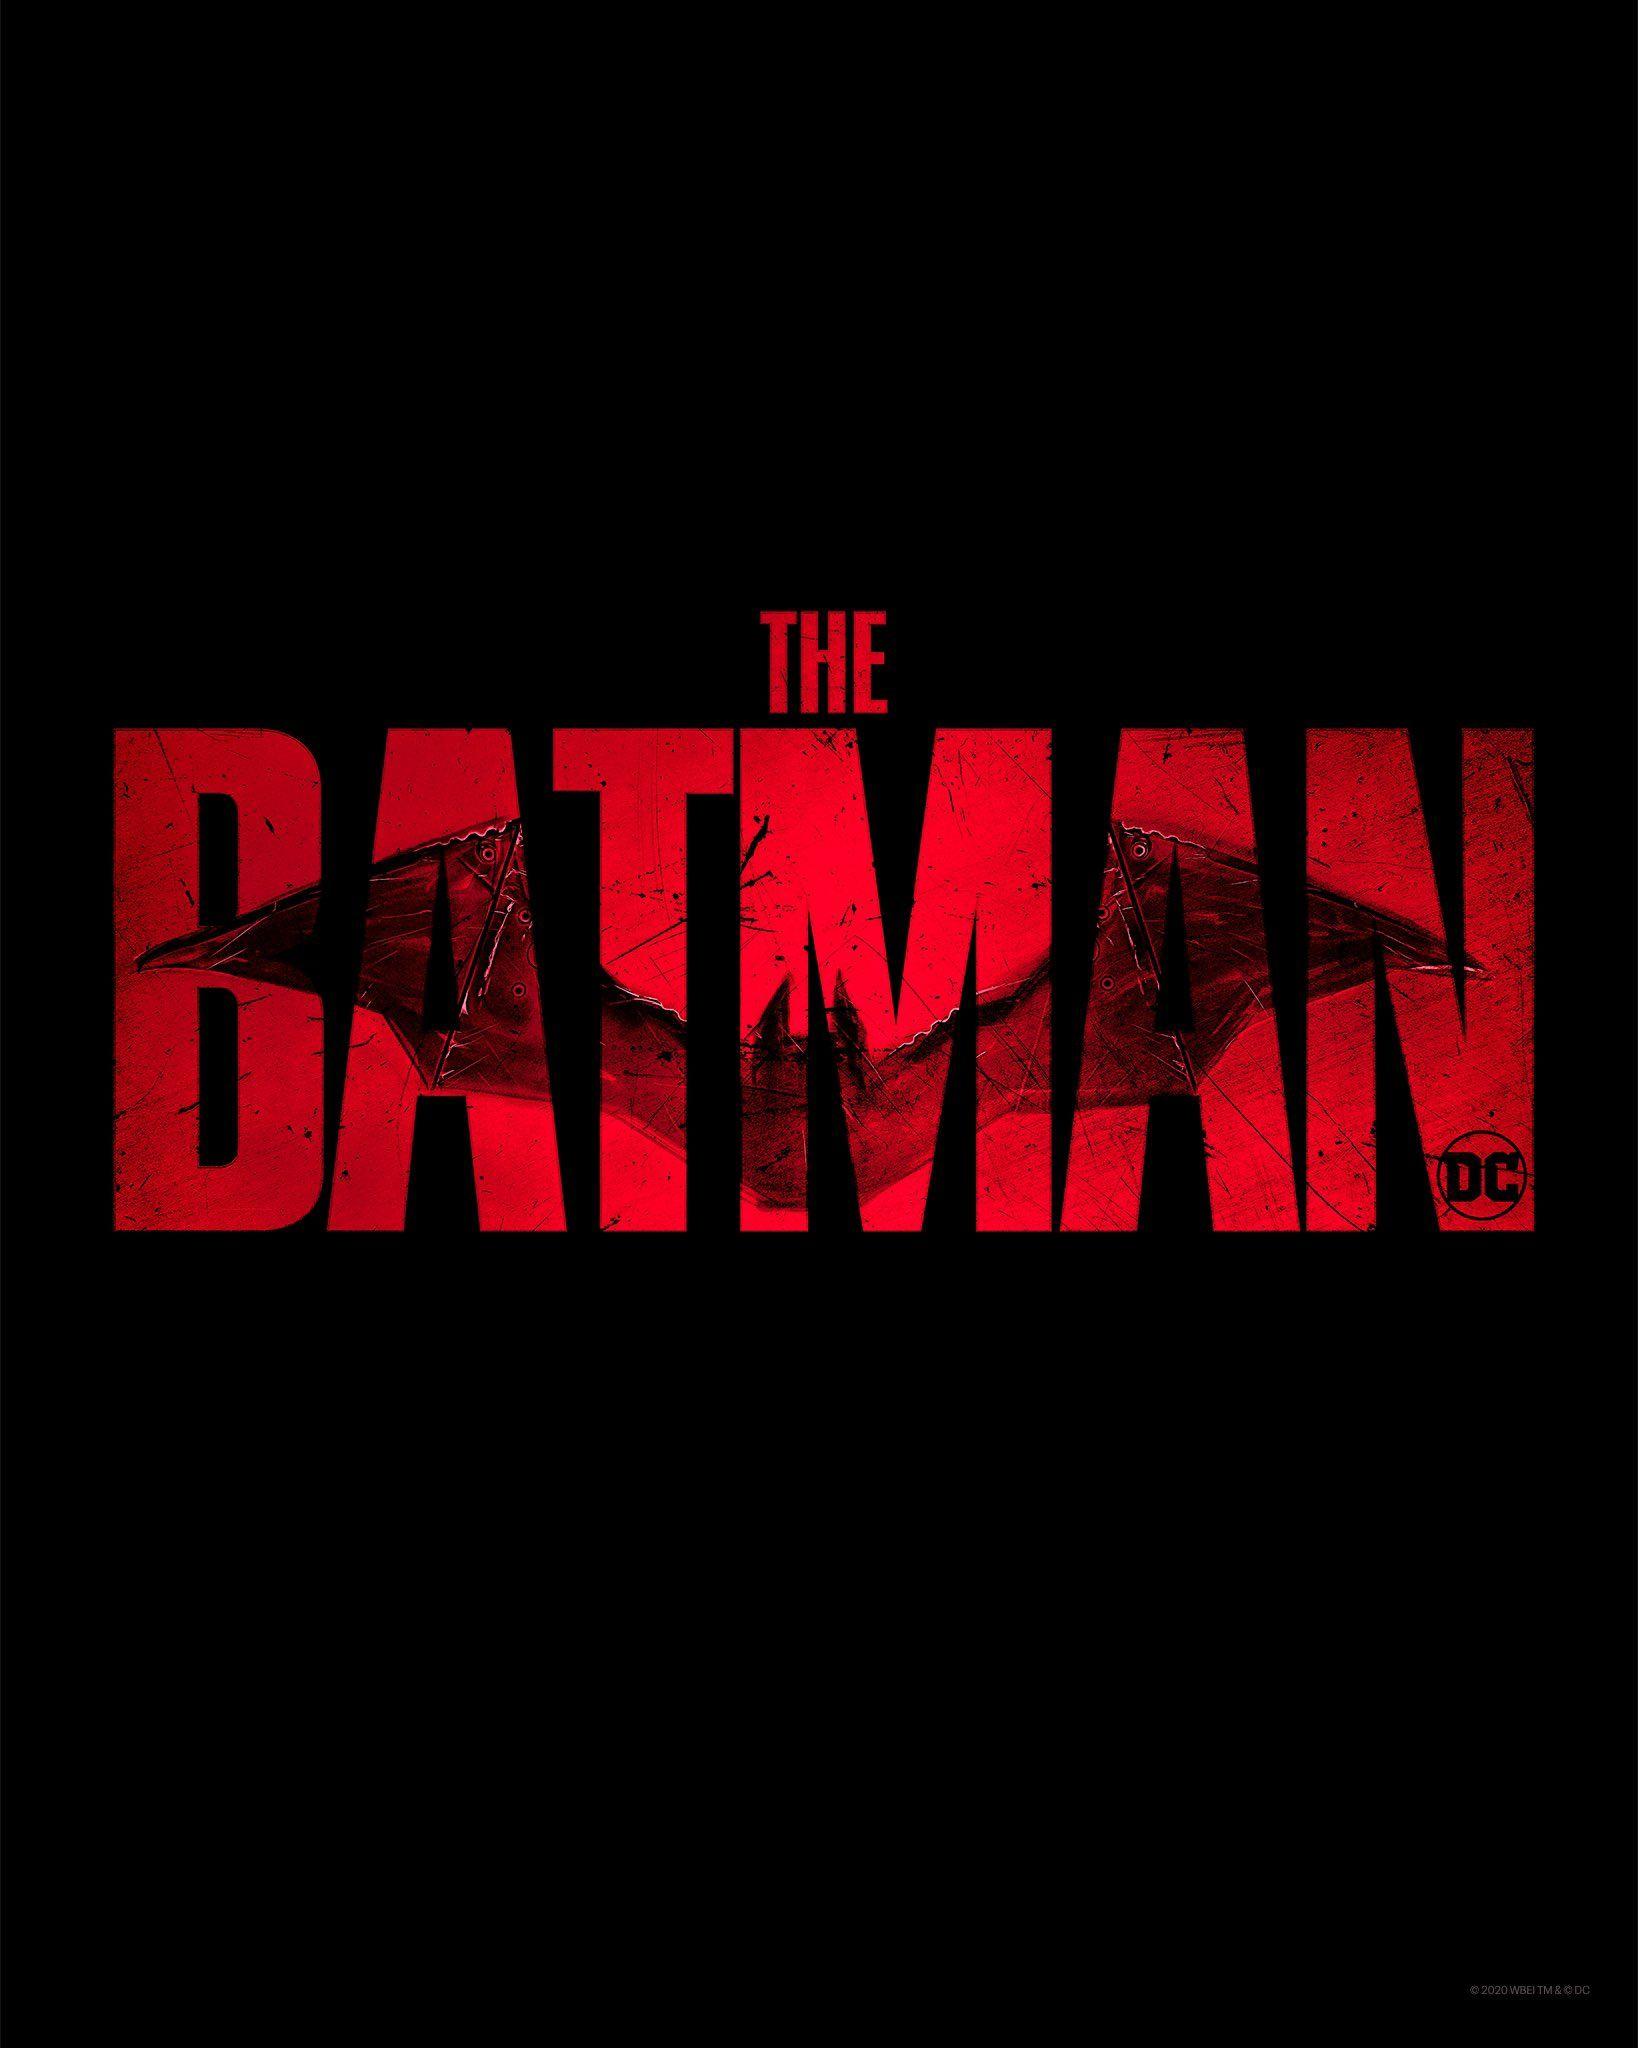 'The Batman' official logo • courtesy @mattreevesLA